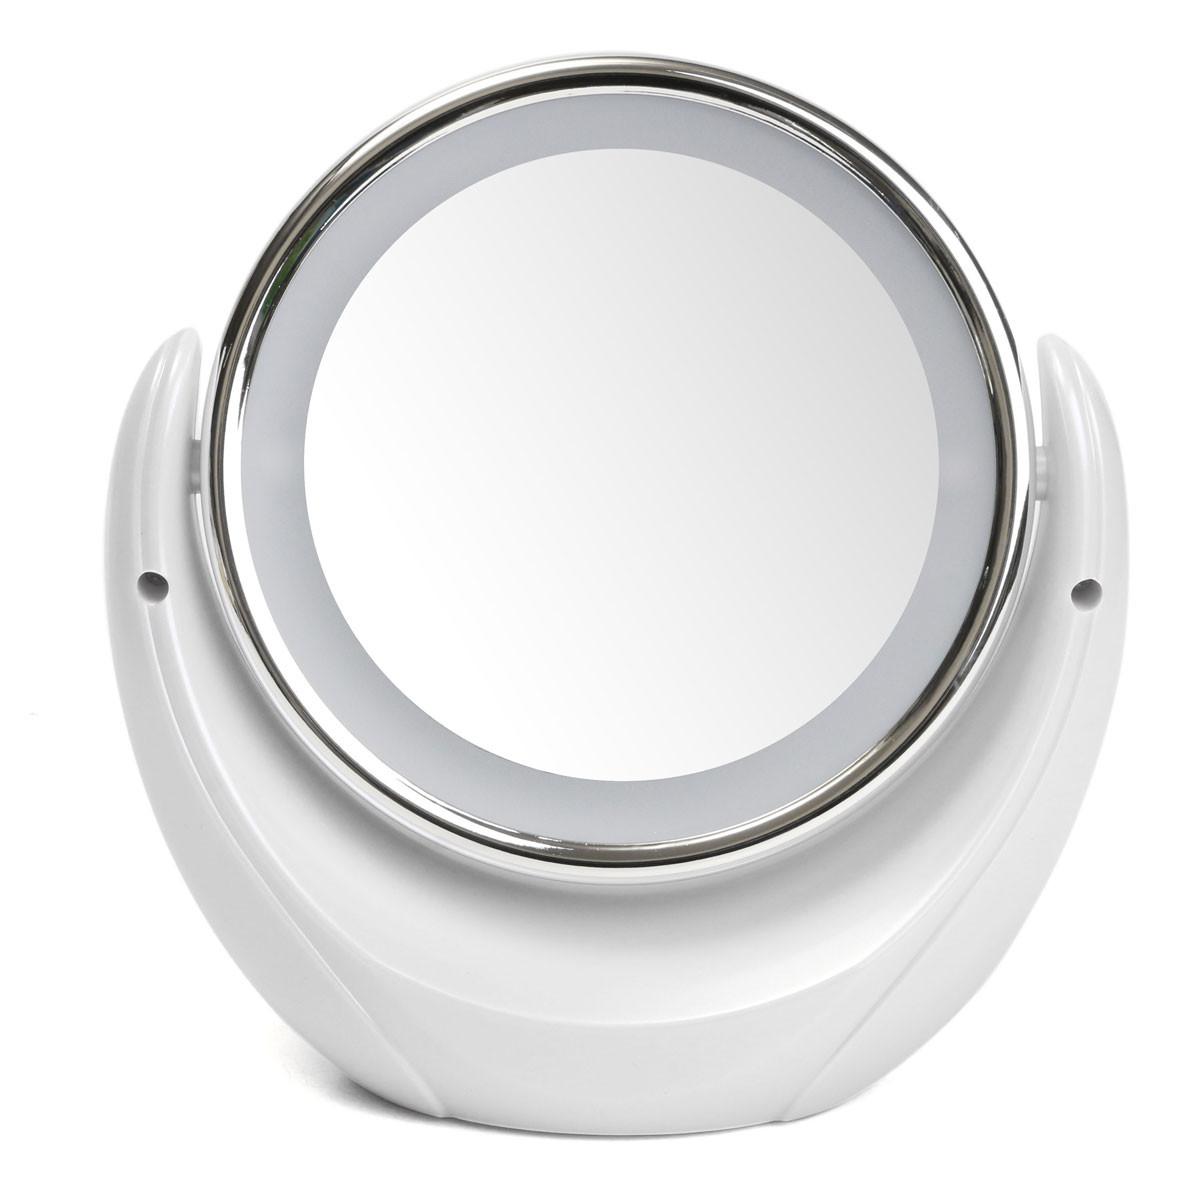 Desktop Double Sided Swivel Led Cosmetic Makeup Mirror